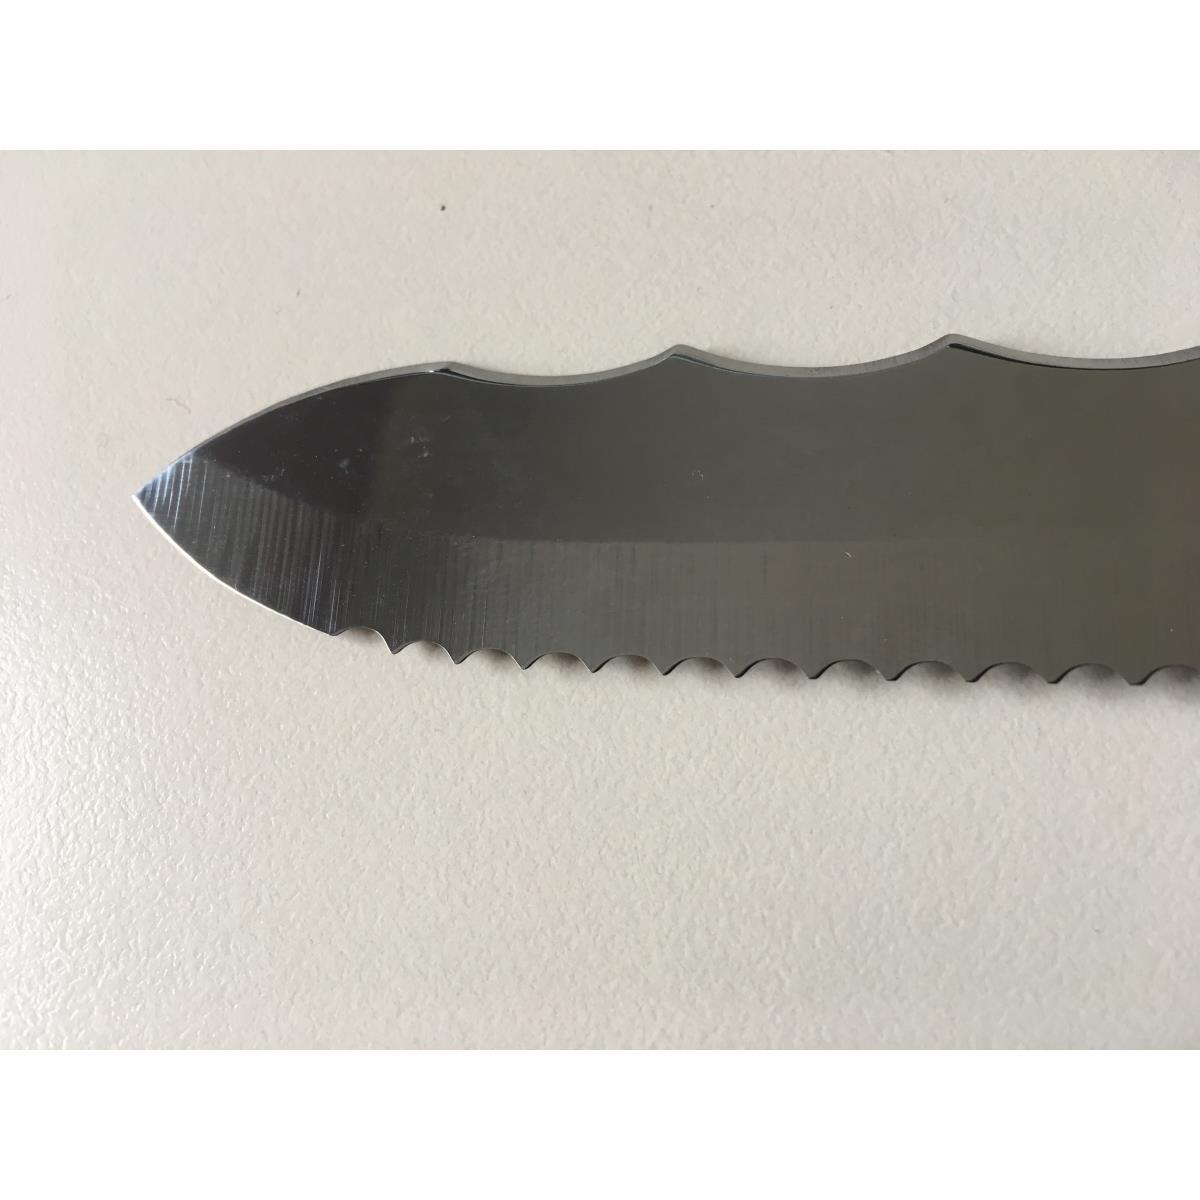 Dämmstoffmesser Dämmstoffschneider doppelseitig Säge Messer Wellenschliff ,Vagner SDH,000051202068, 6920998201293